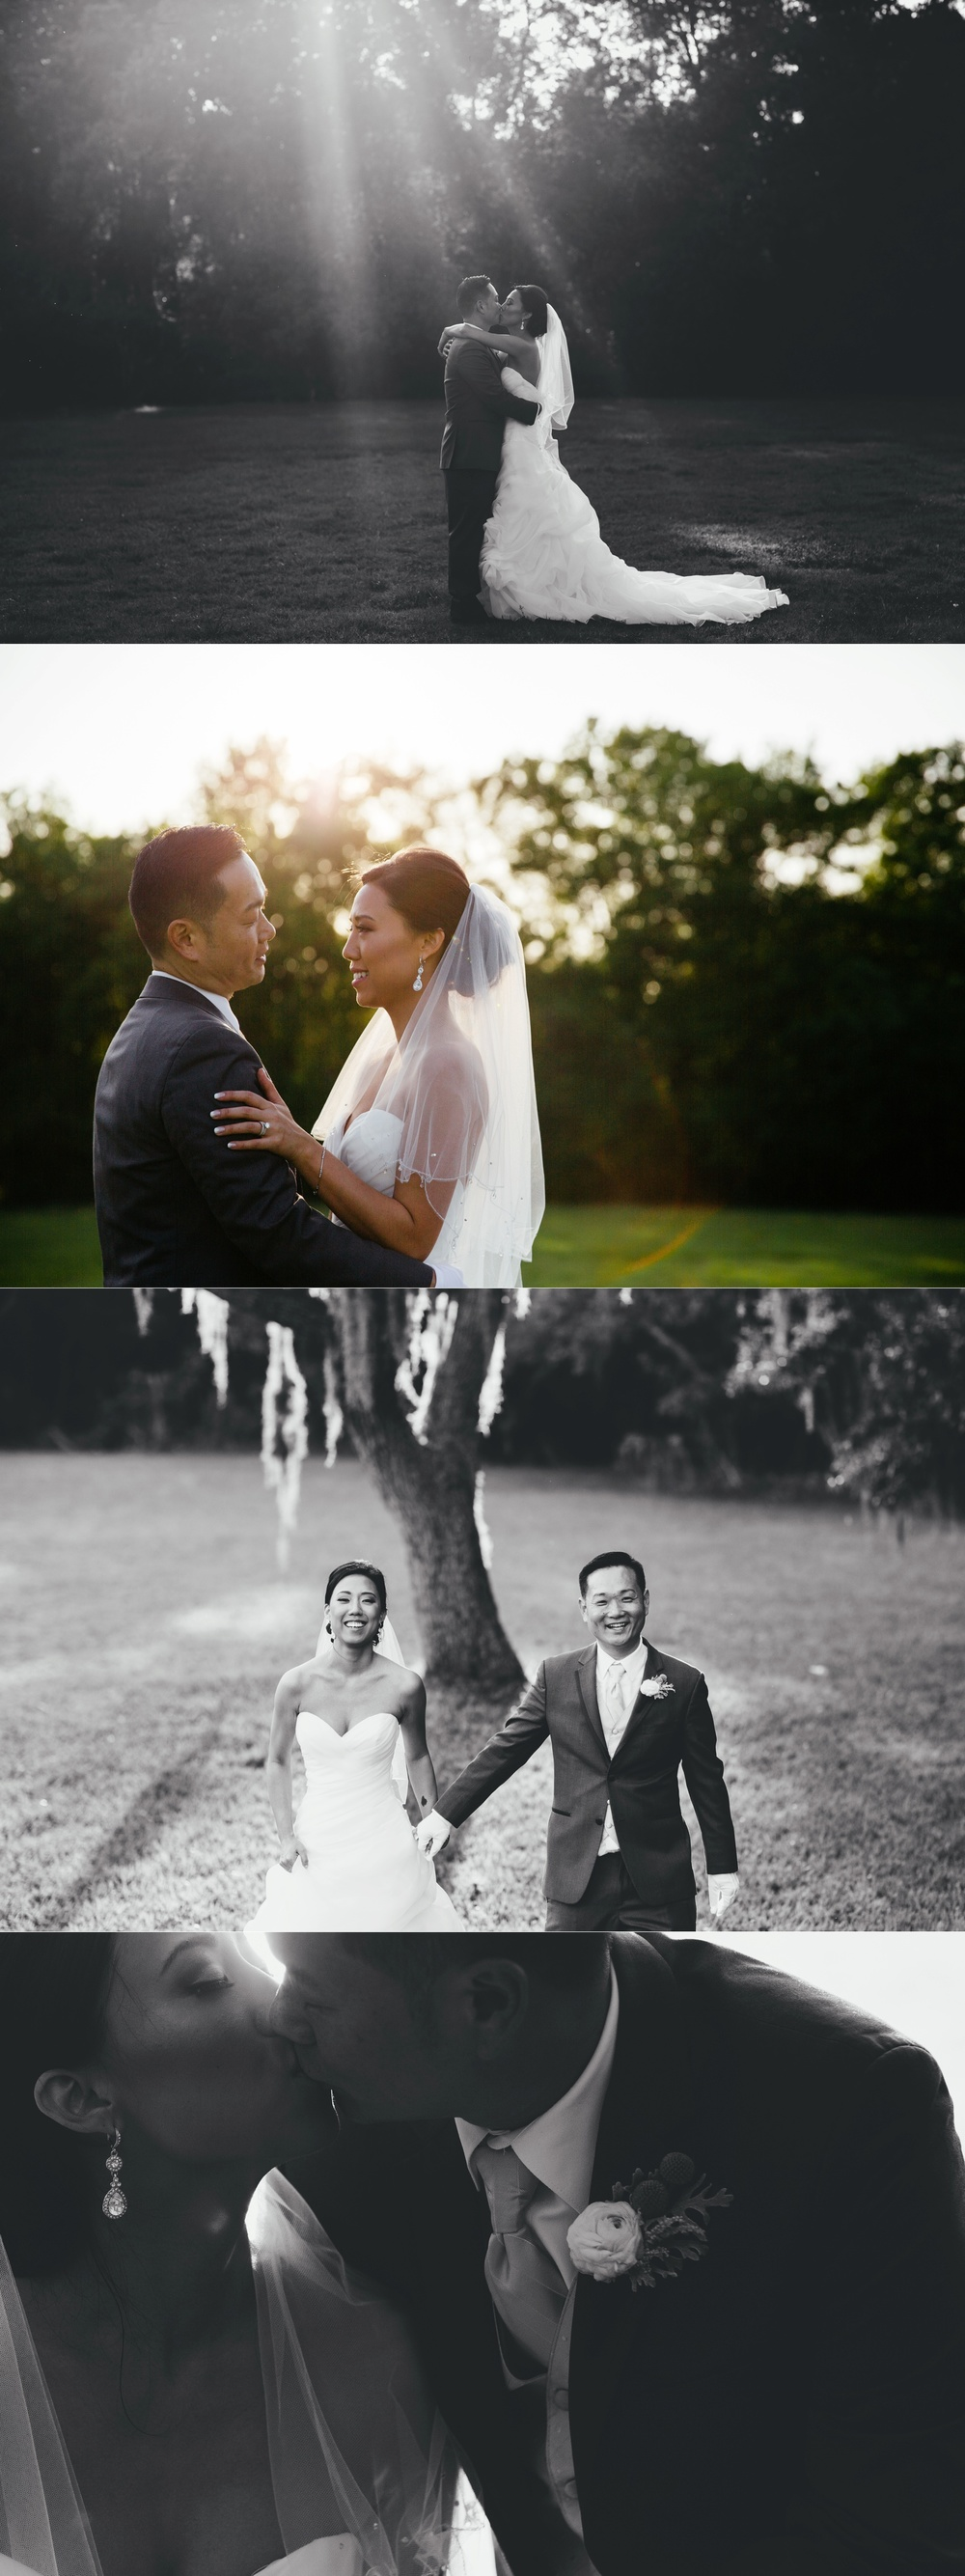 jake-and-katie-wedding-favorites-2015-51